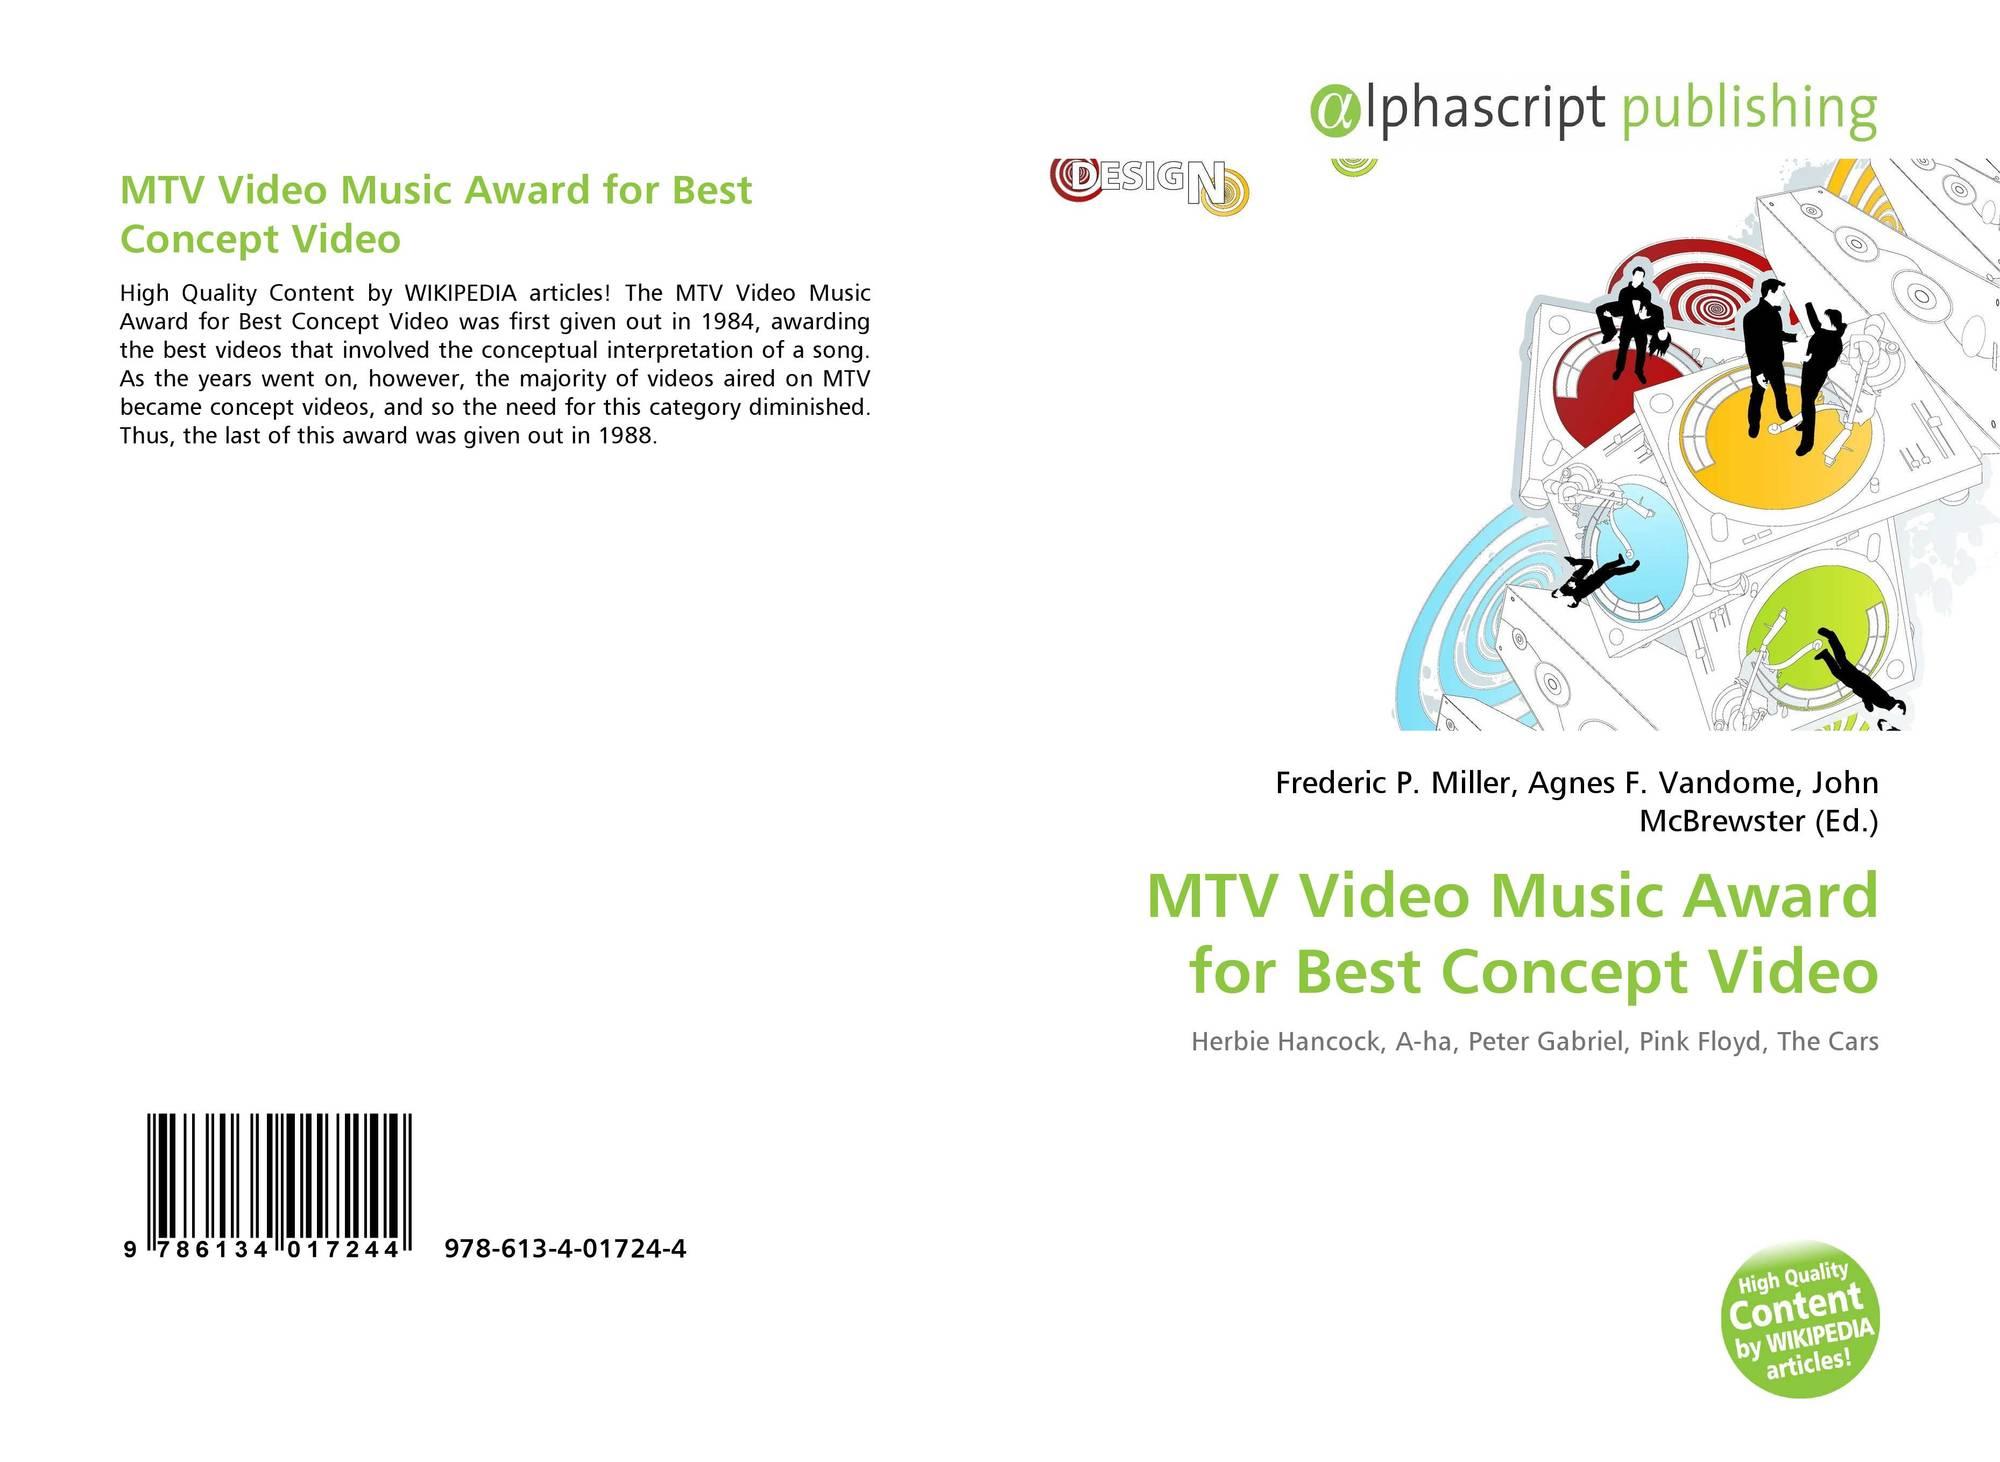 MTV Video Music Award for Best Concept Video, 978-613-4-01724-4